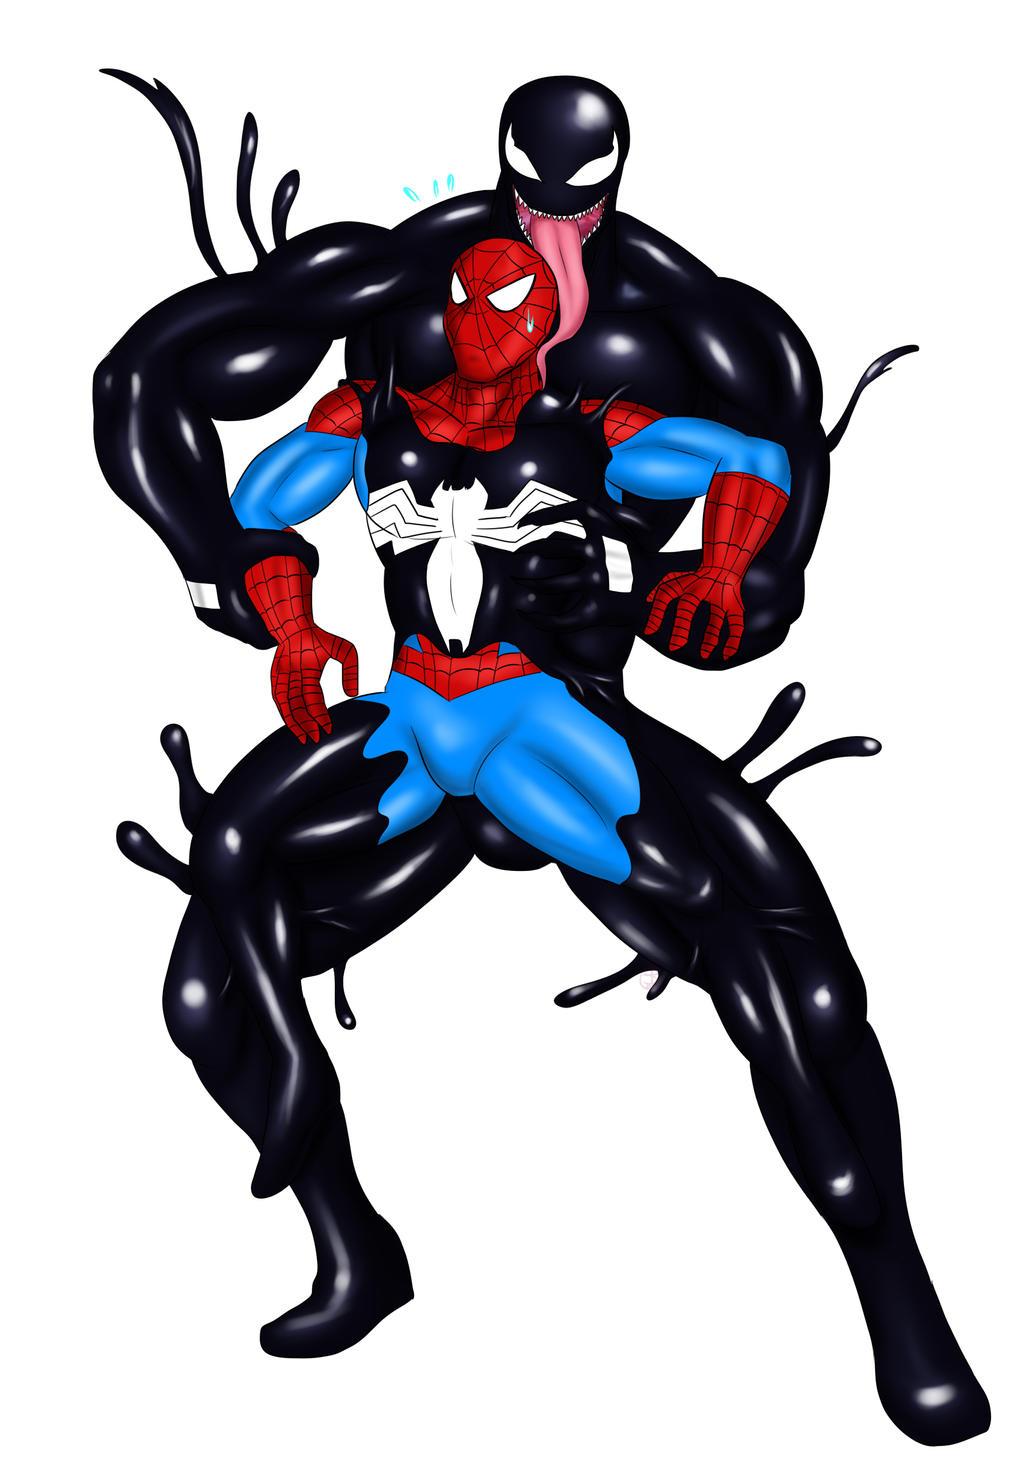 Spiderman VS Venom by St-Alpha on DeviantArt